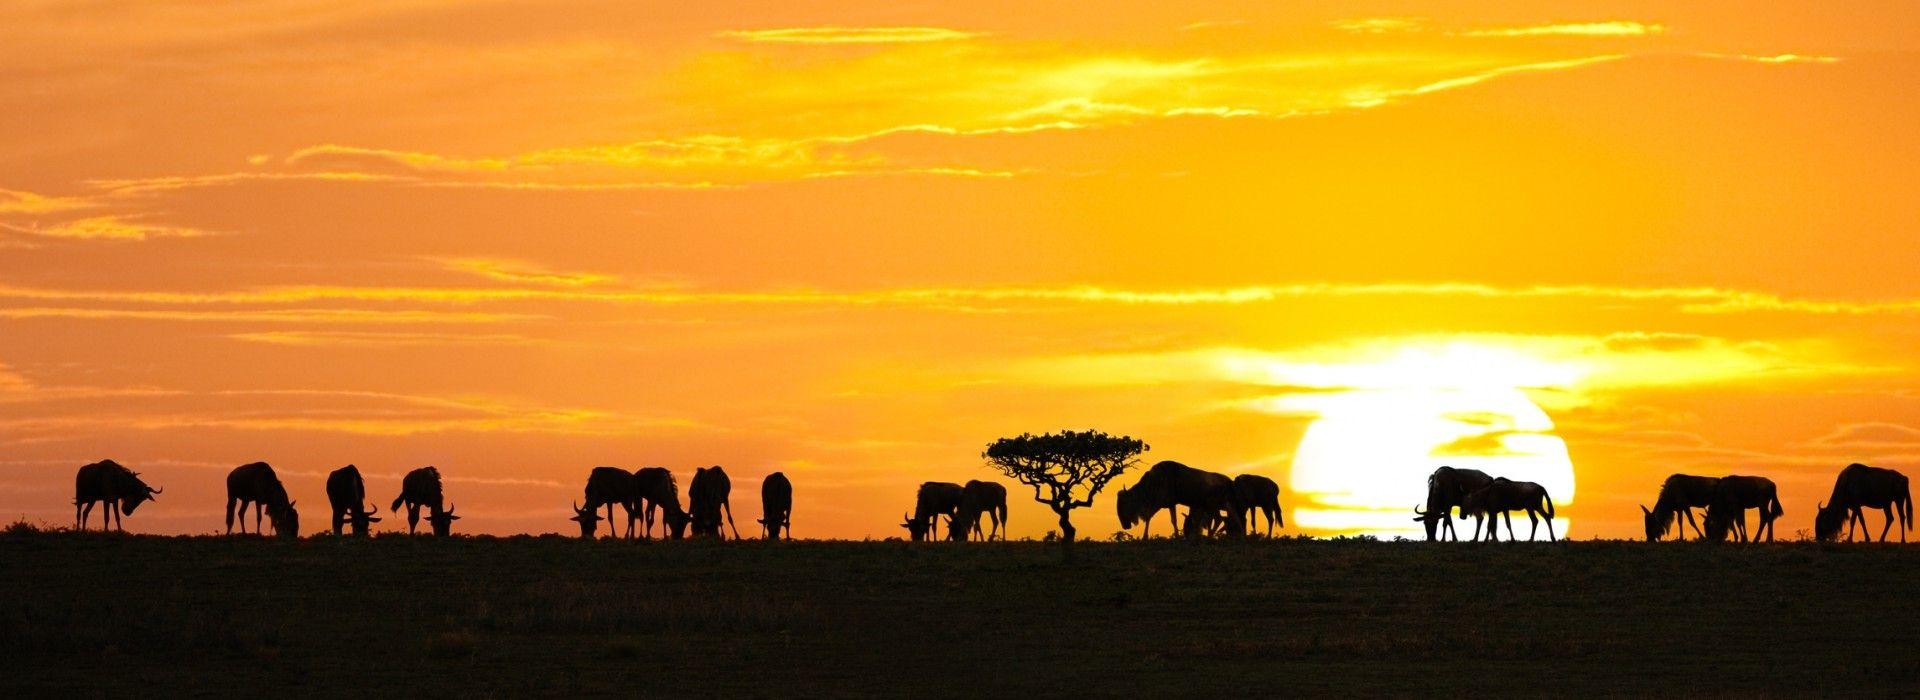 Safari Tours in Stone Town